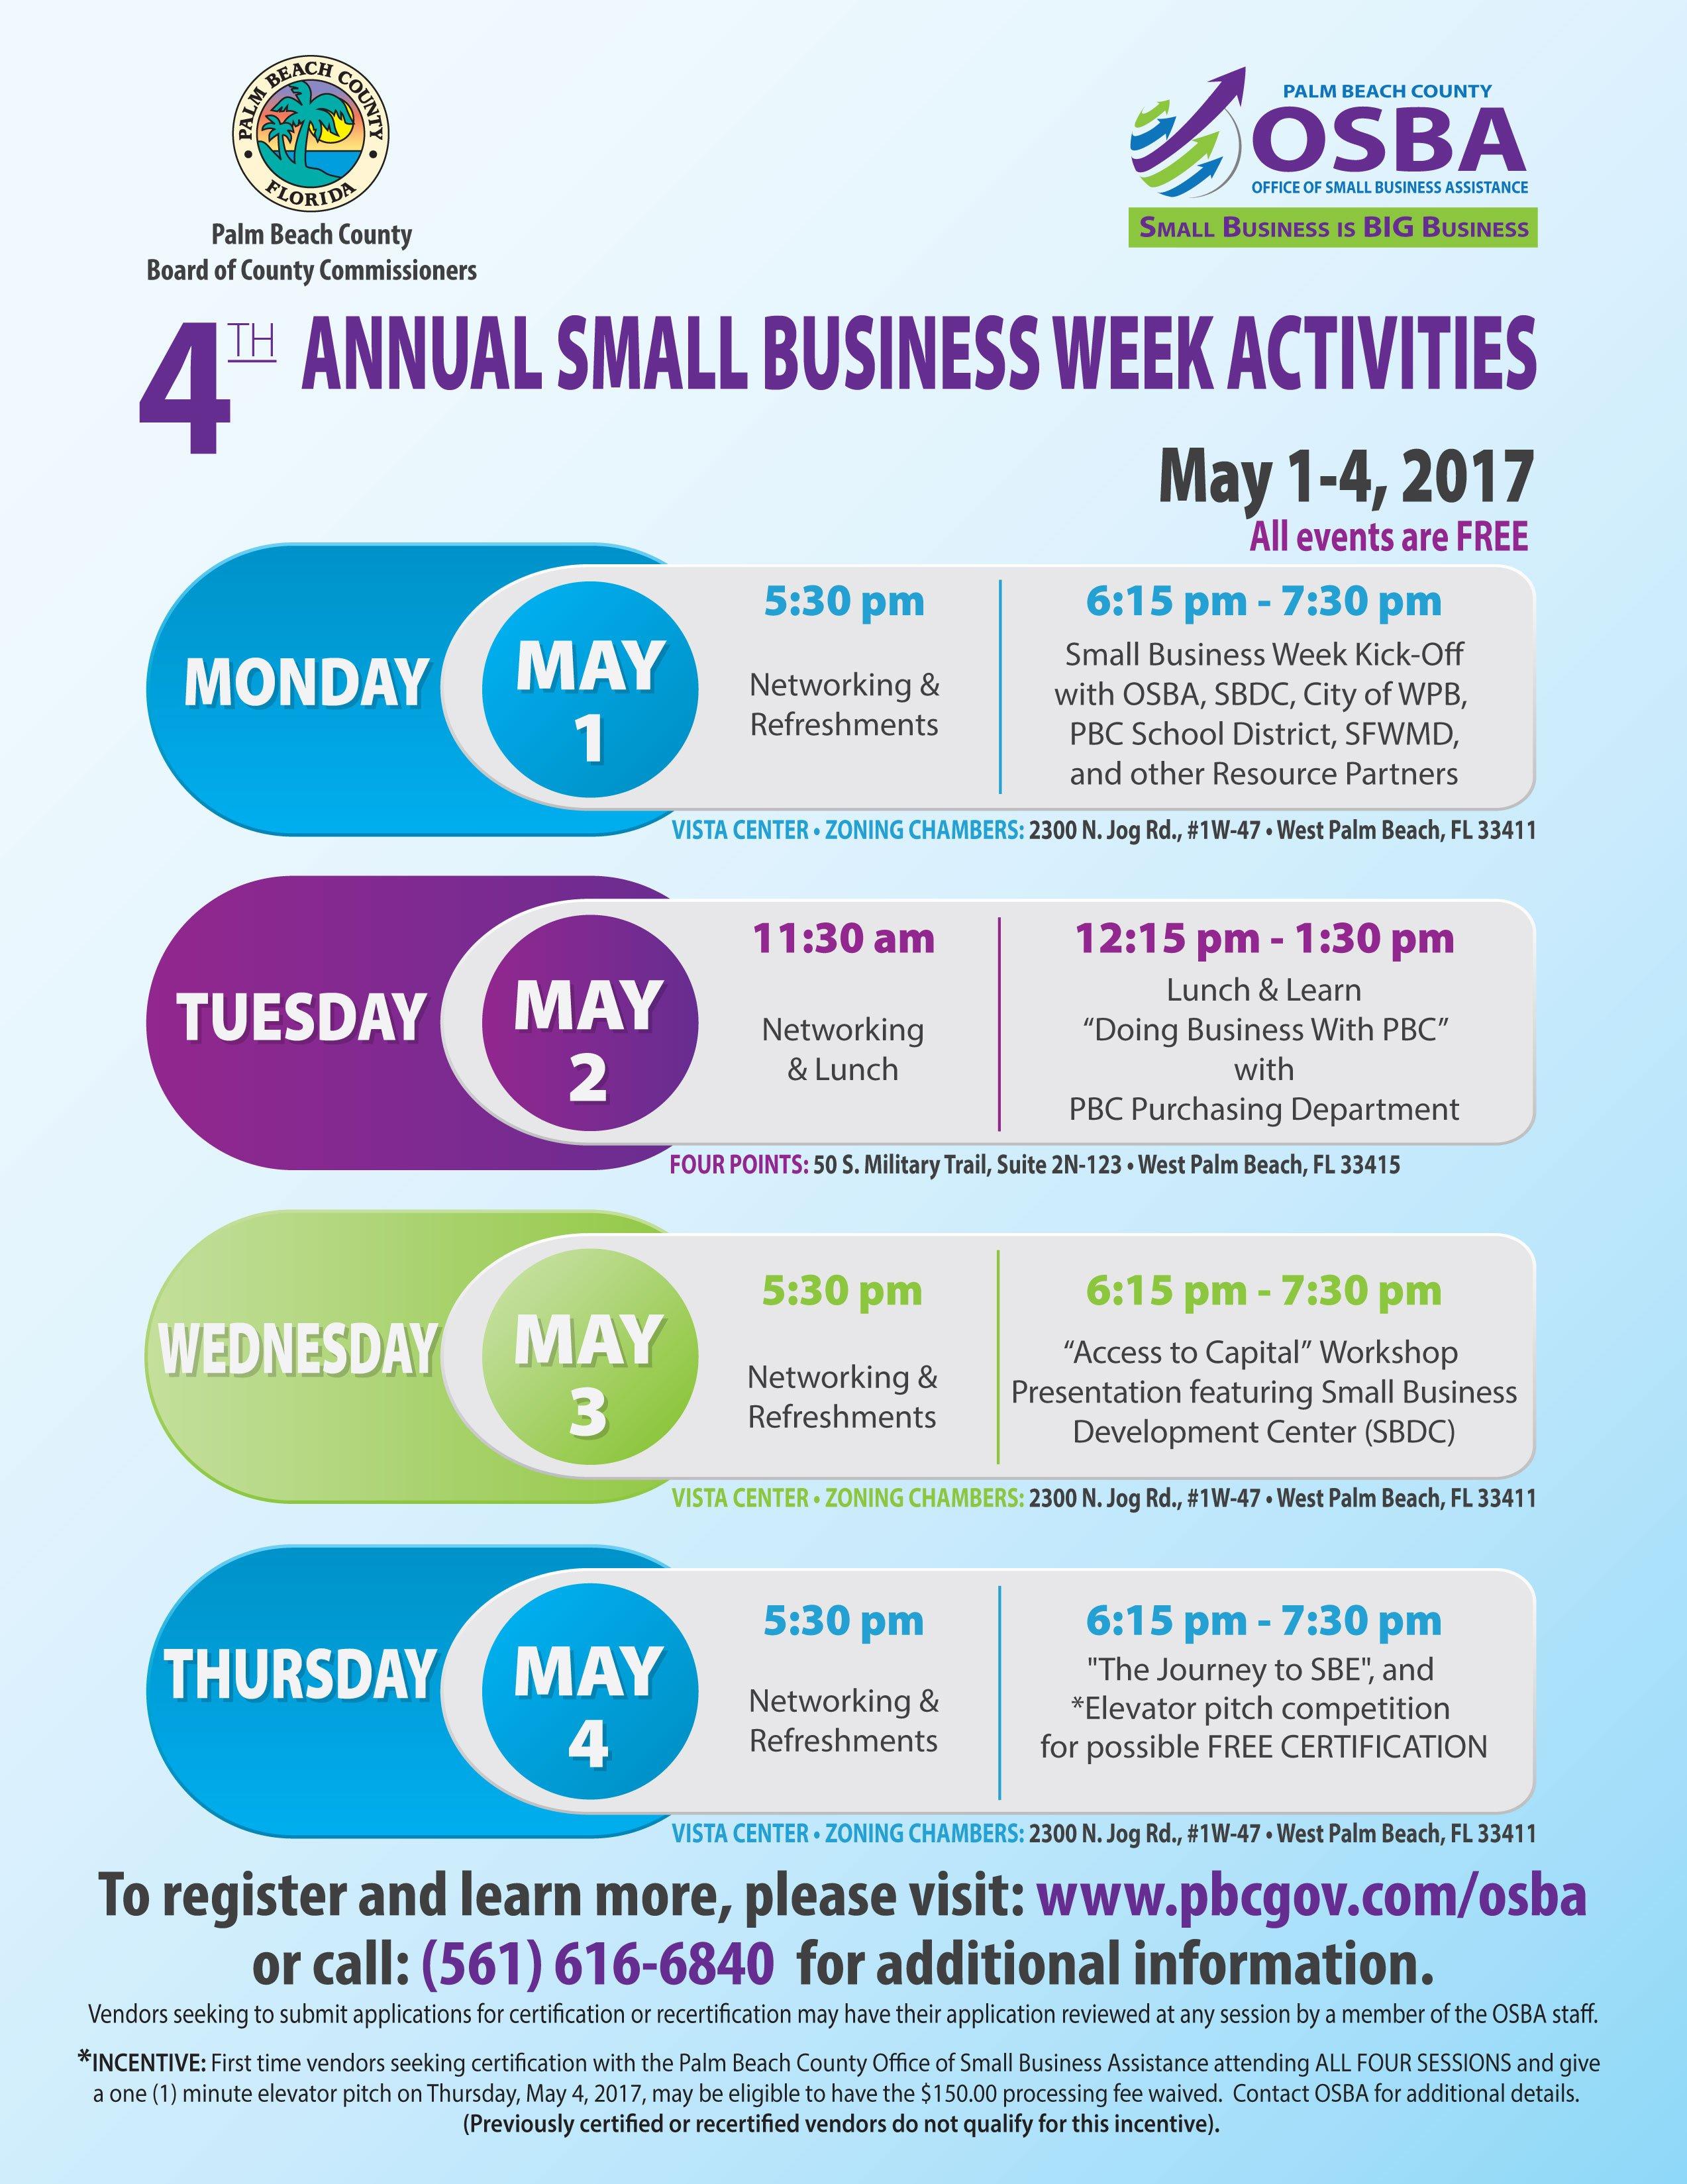 OSBA_Small-Business-Week-20